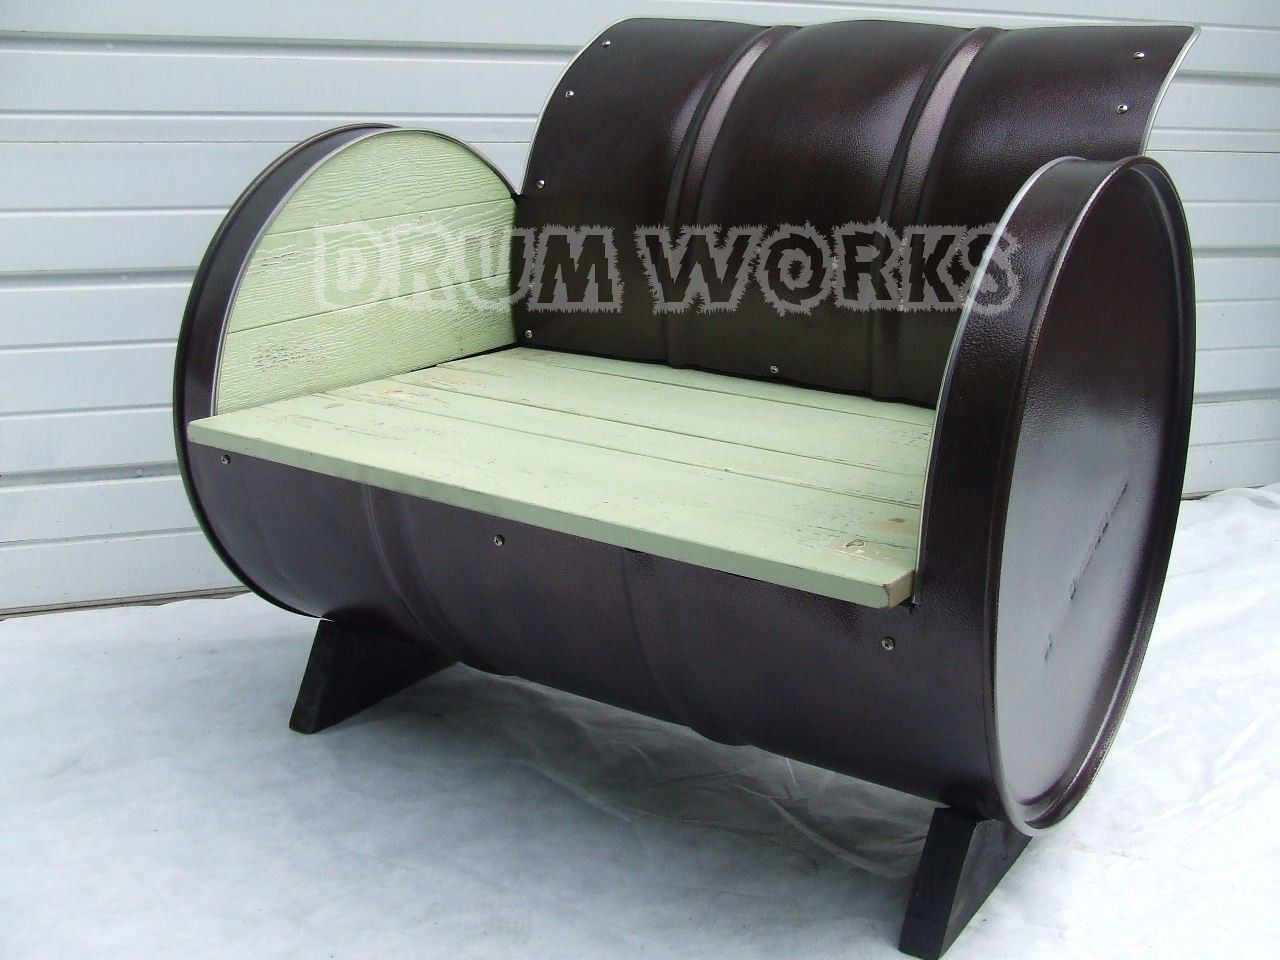 Outdoor 55 Gallon Drum Chair Hammer Tone Copper Powder Coat